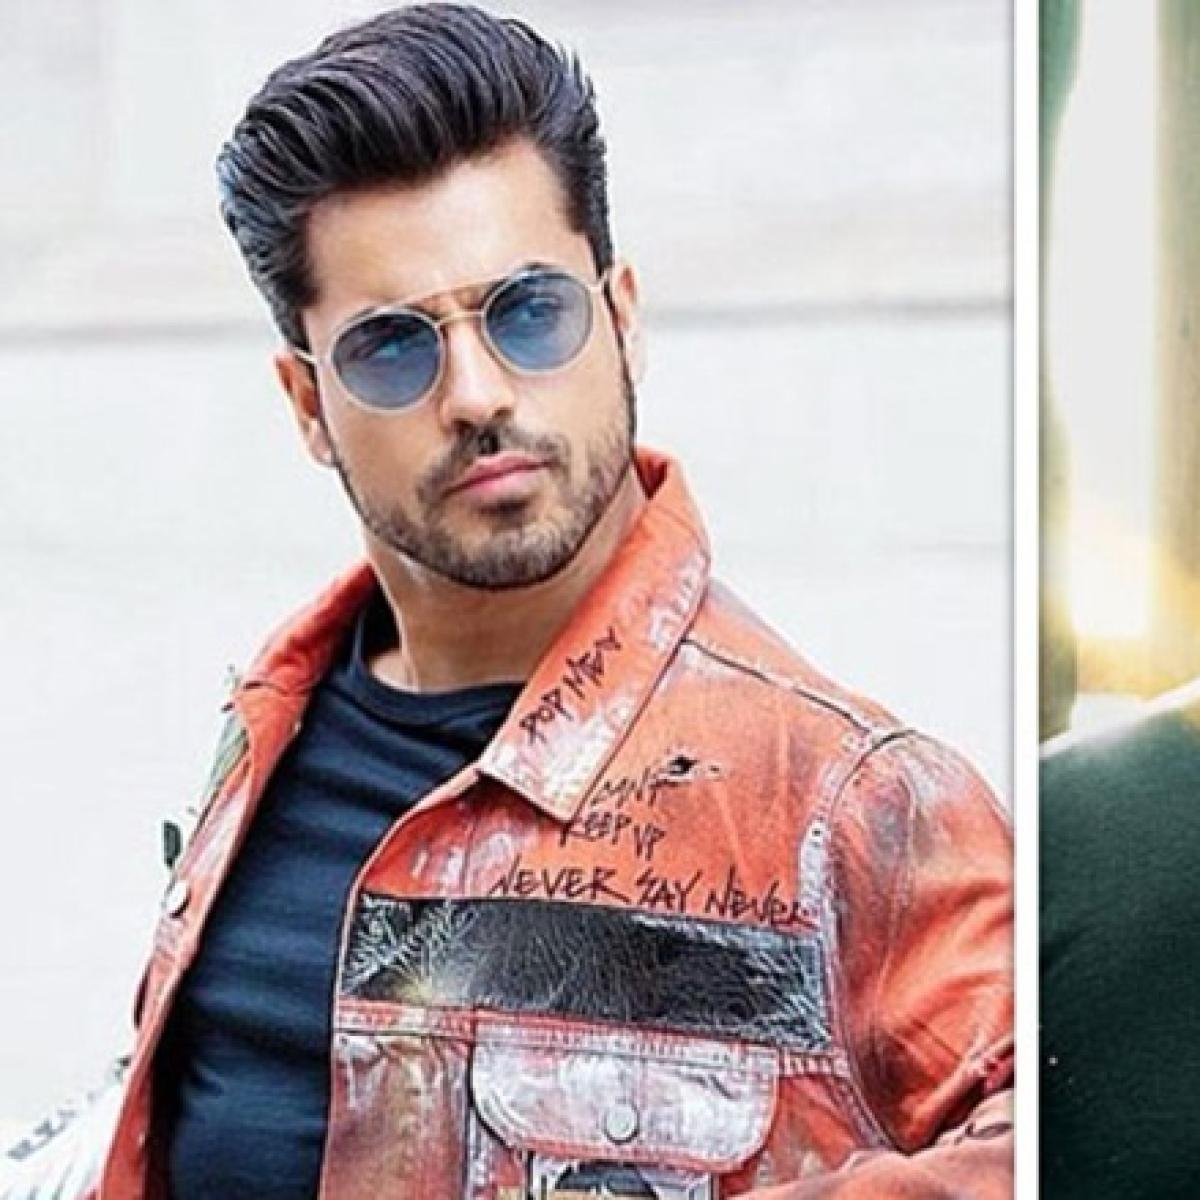 Bigg Boss fame Gautam Gulati joins Salman Khan for 'Radhe: Your Most Wanted Bhai'